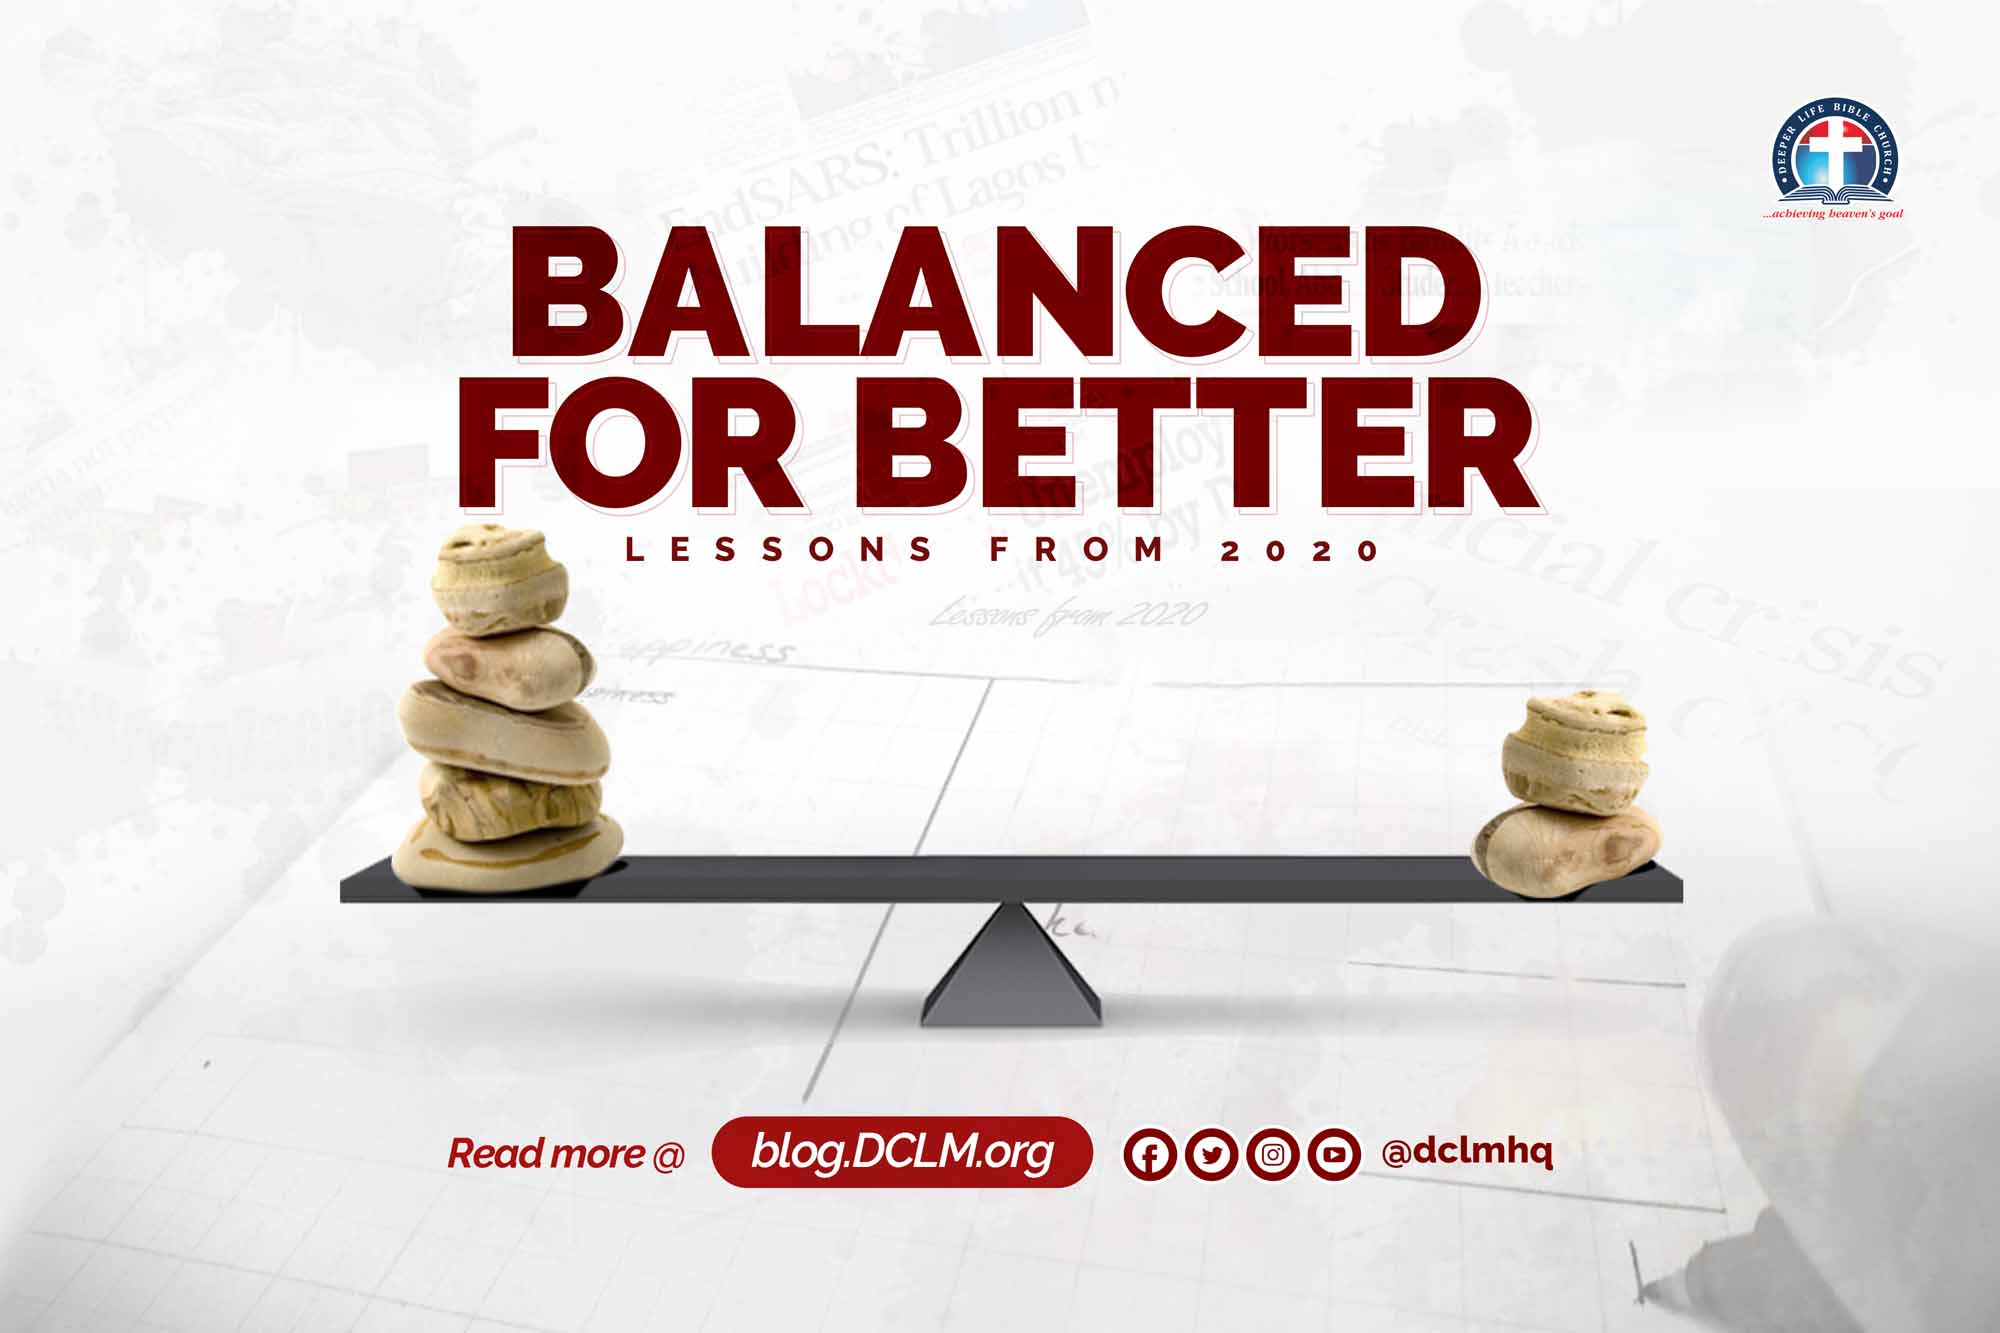 Balanced, Better, Time, Time Management, Productivity, Life Hacks, Christian Living, Daily Living, Work Life, Spiritual Life,